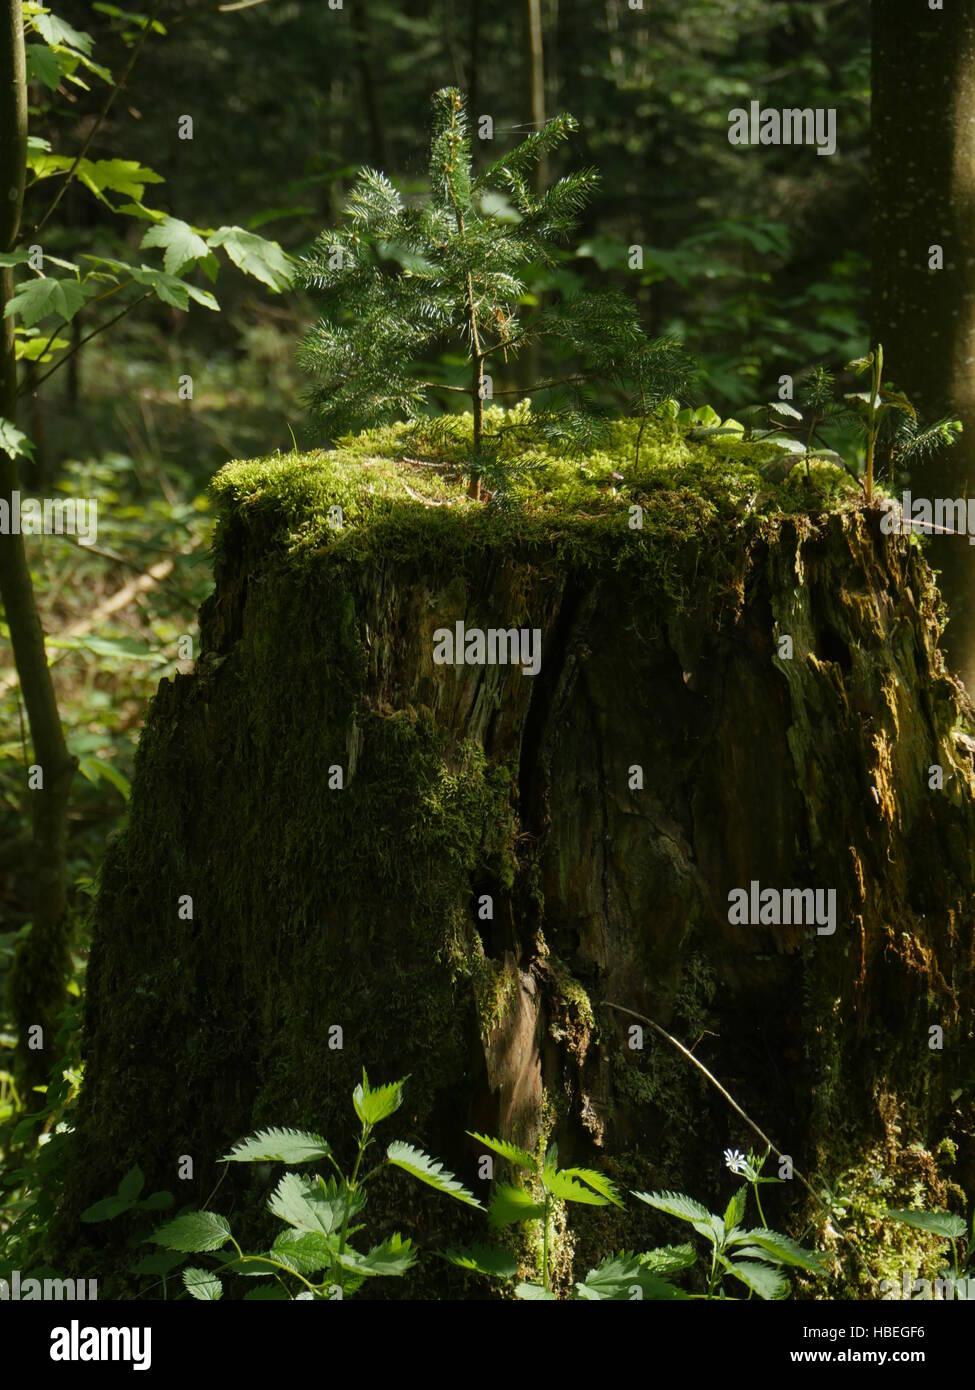 Fir tree growing on stub - Stock Image